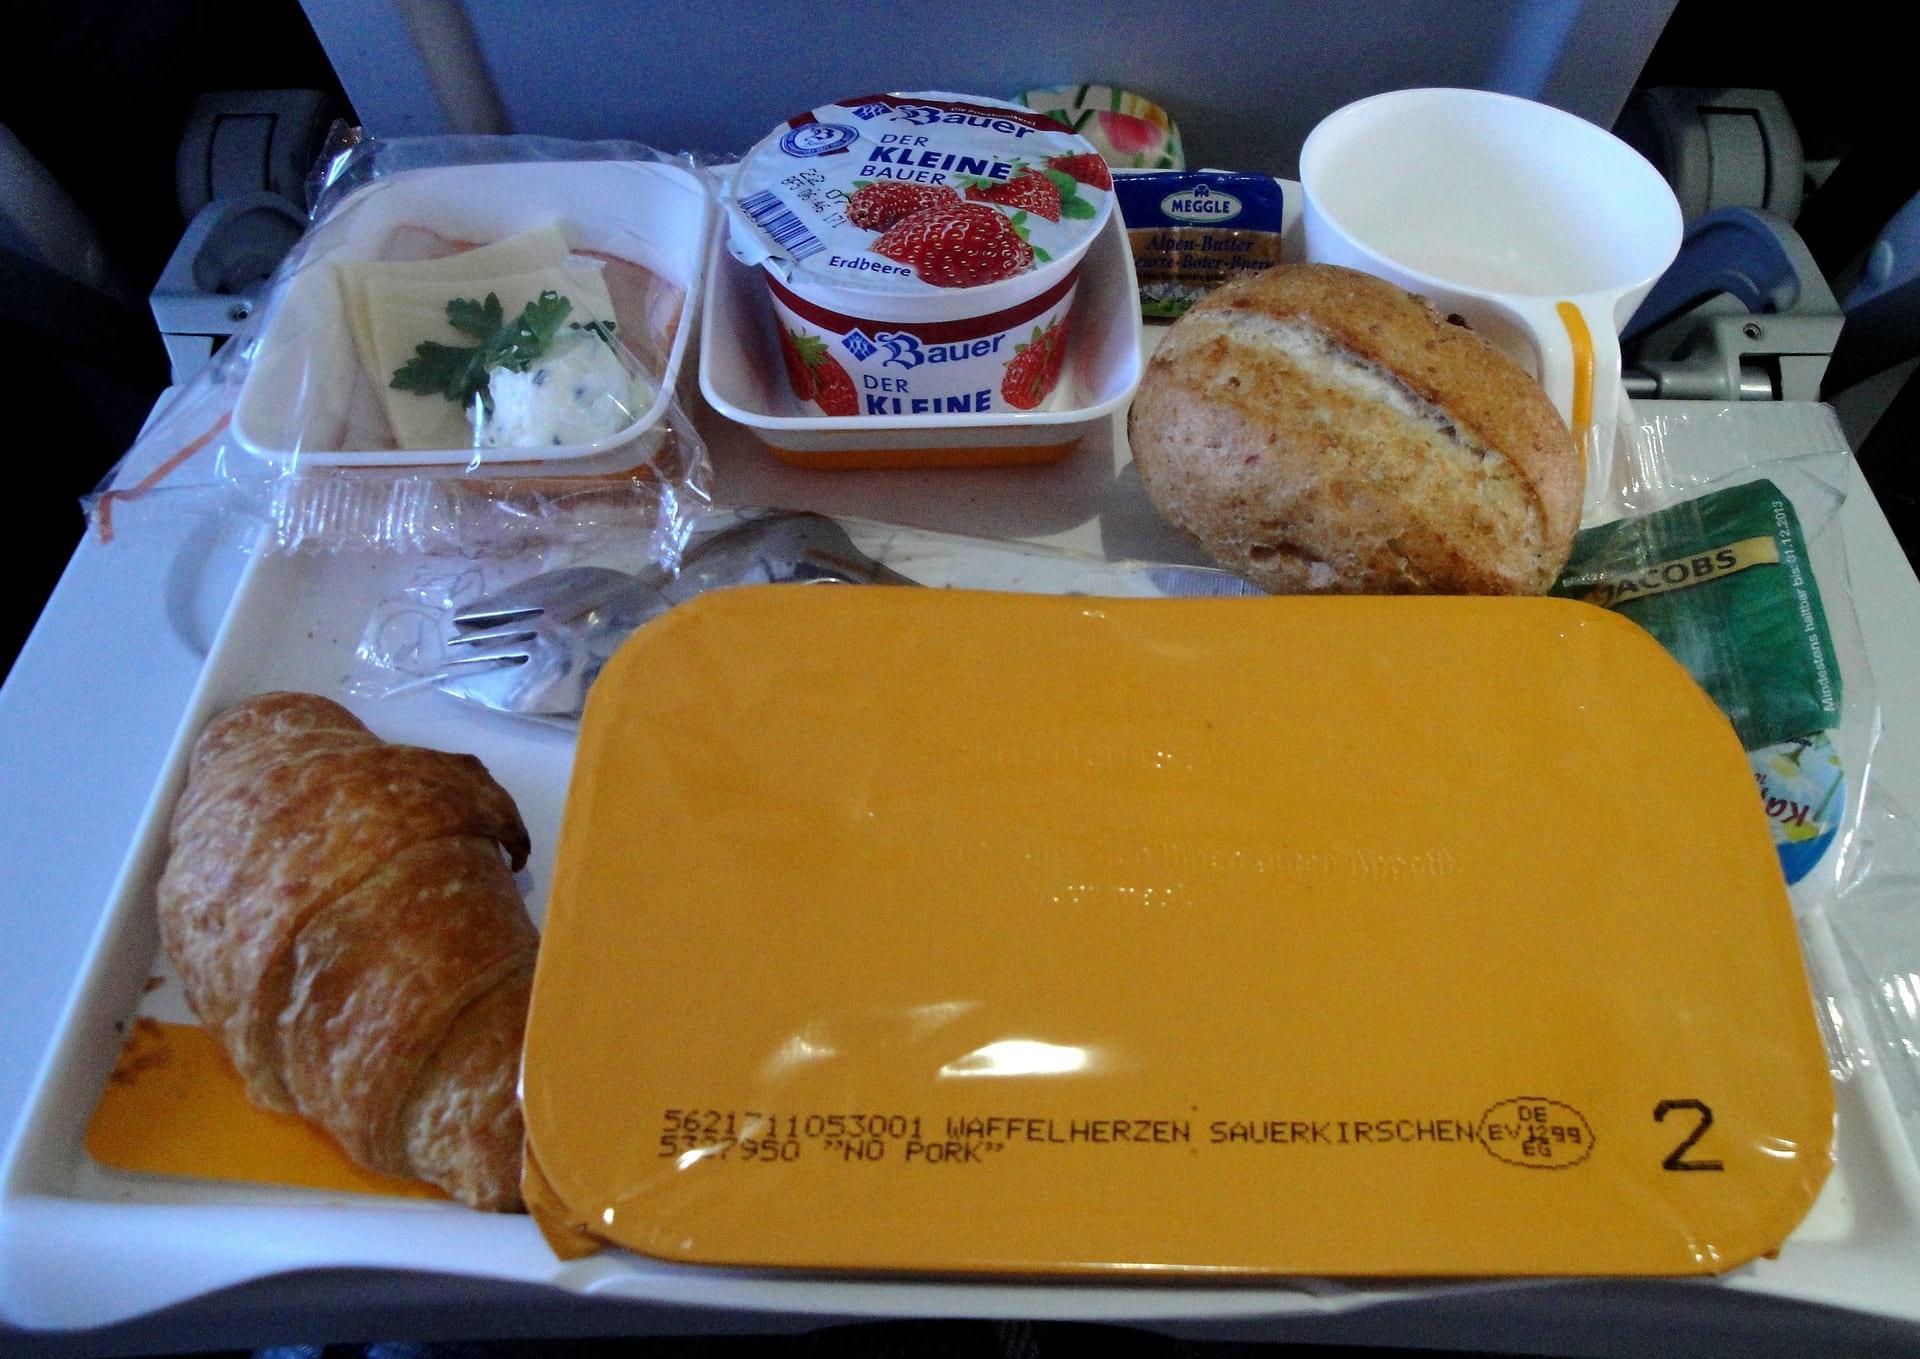 suzanne food picnic plane food